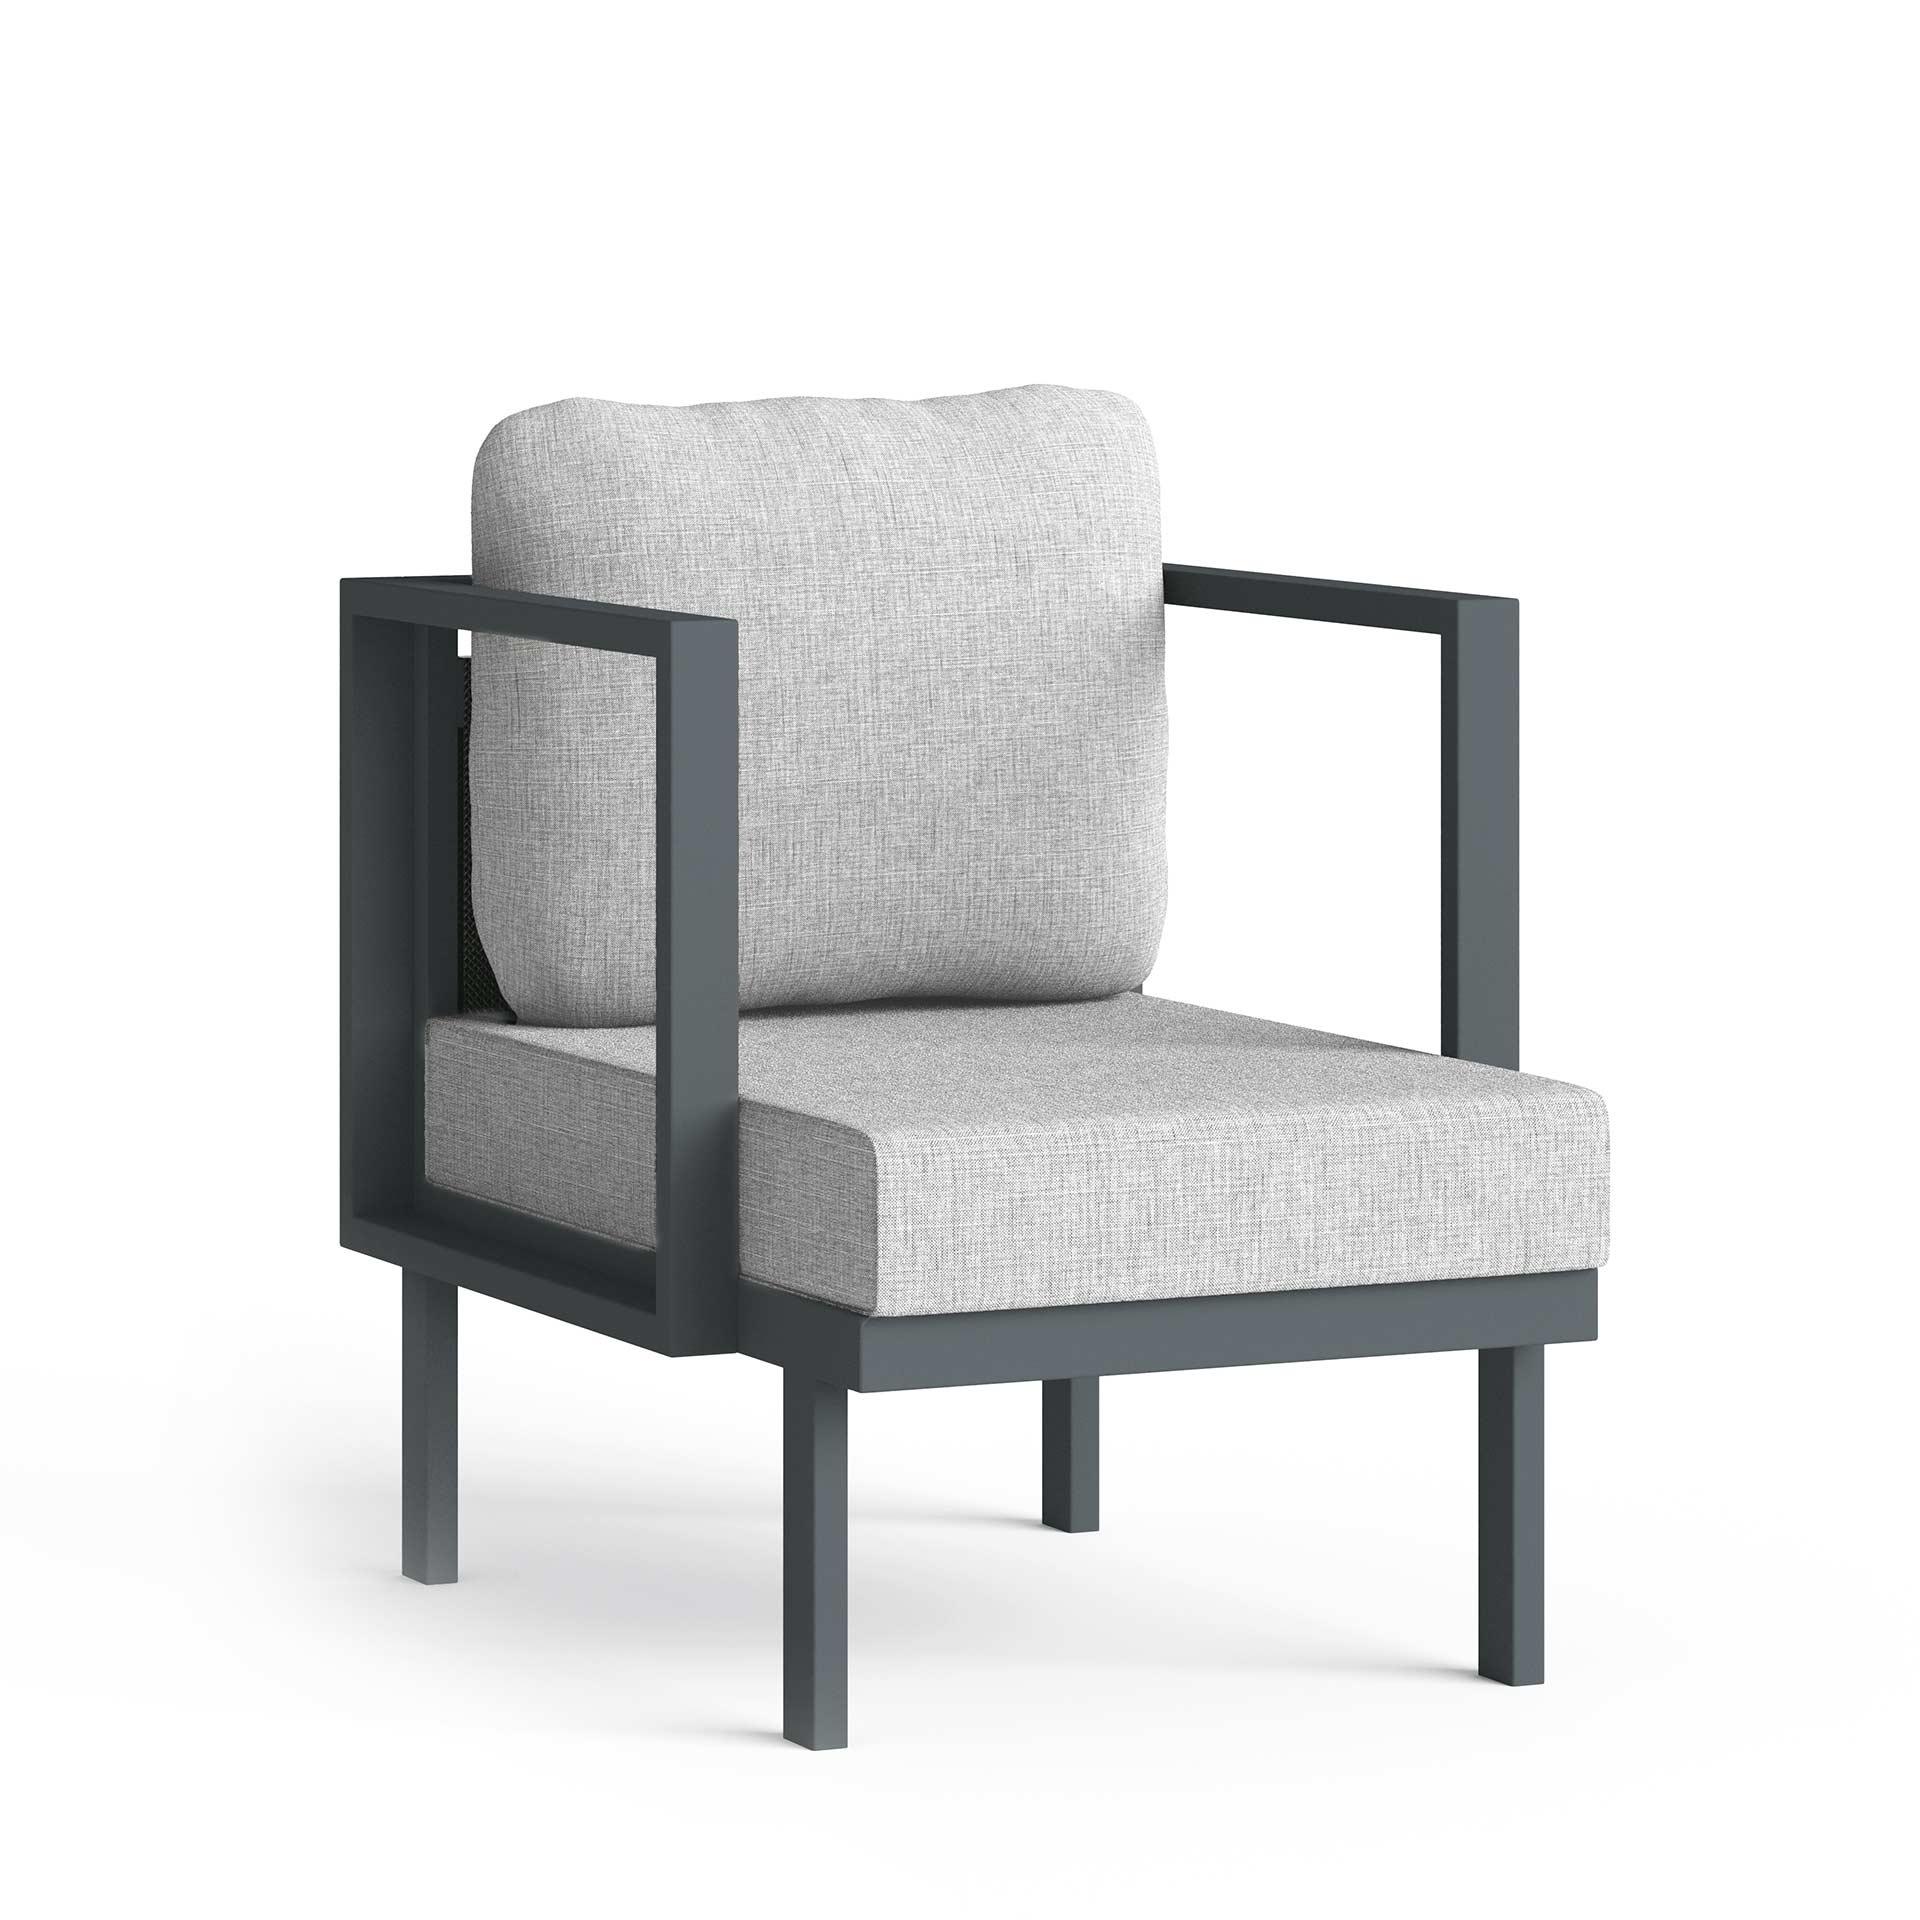 Maureen Chair Corner View Render Light Grey